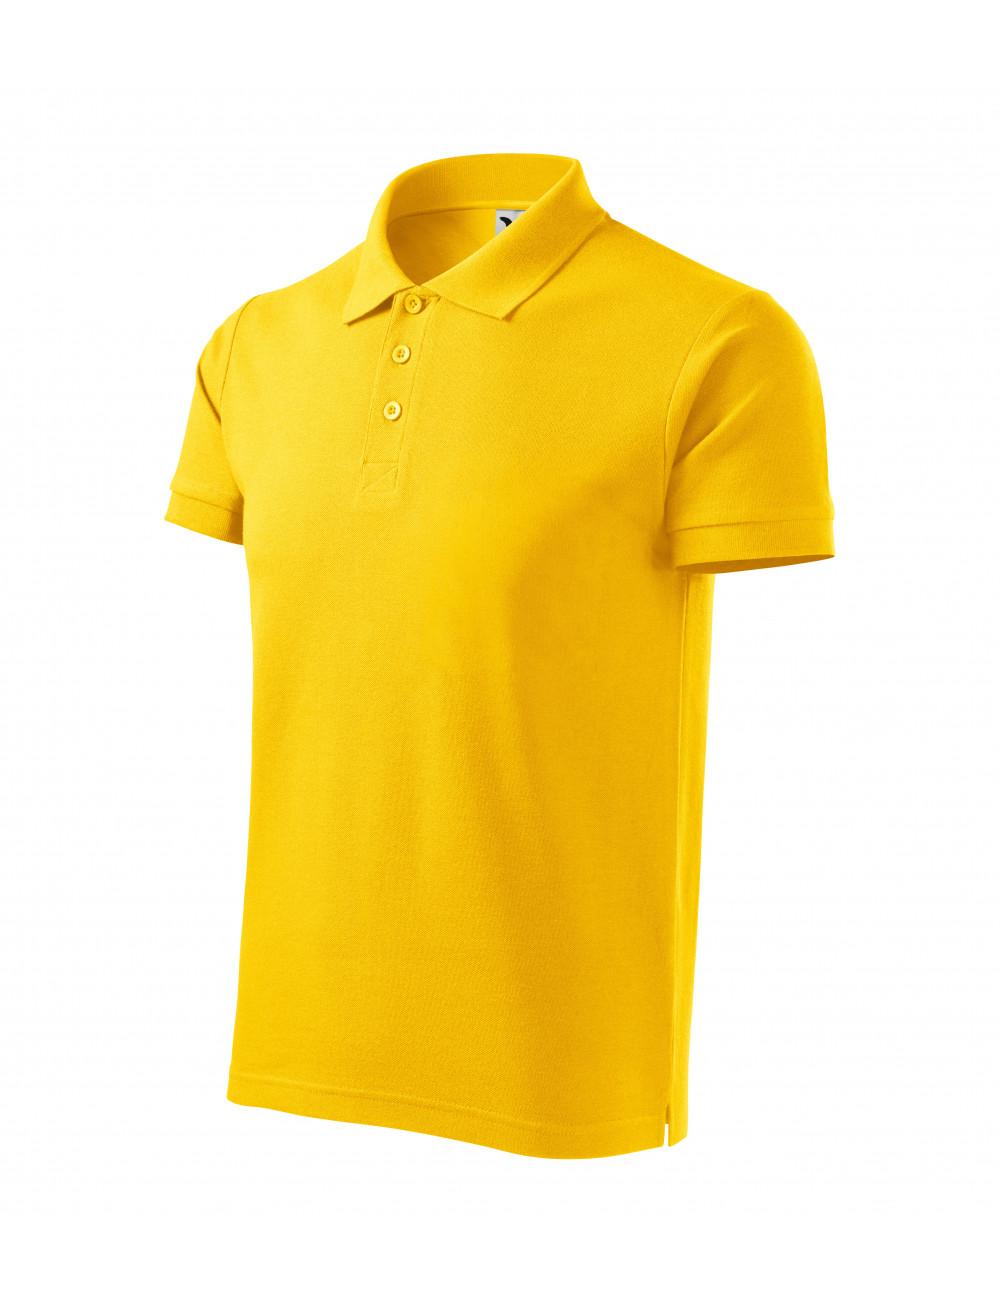 Adler MALFINI Koszulka polo męska Cotton Heavy 215 żółty